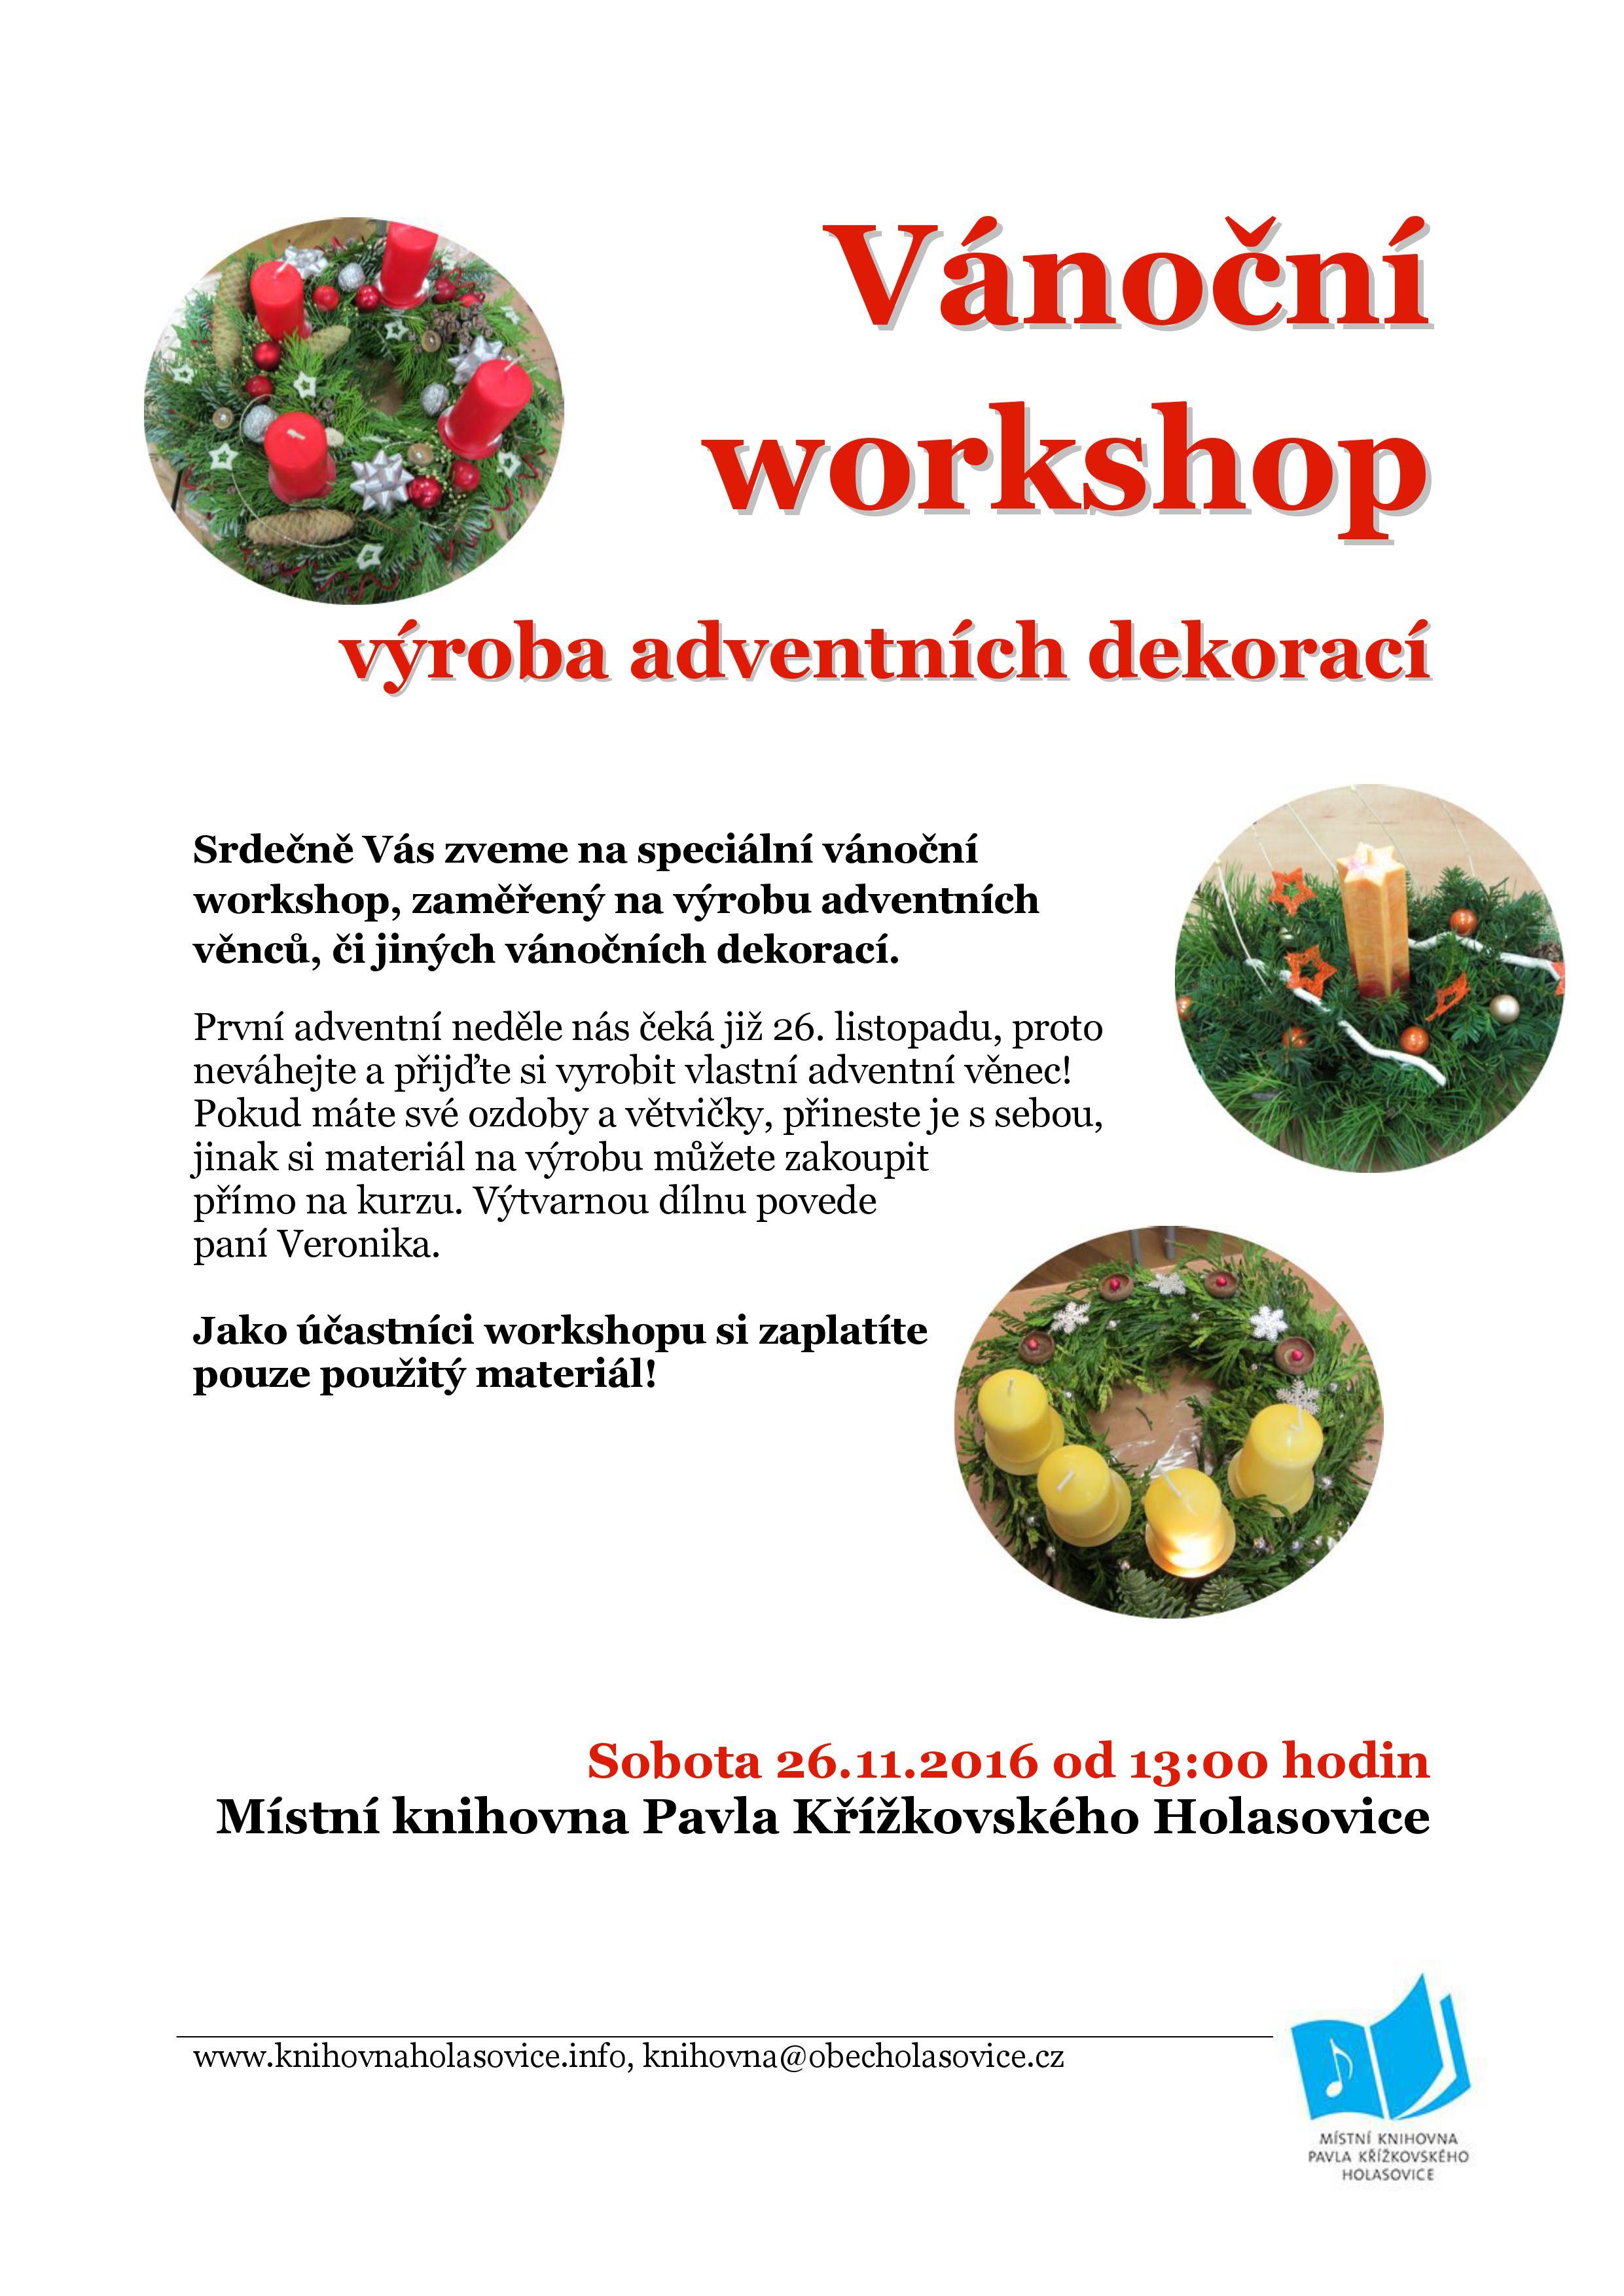 pozvanka-vanocni-workshop